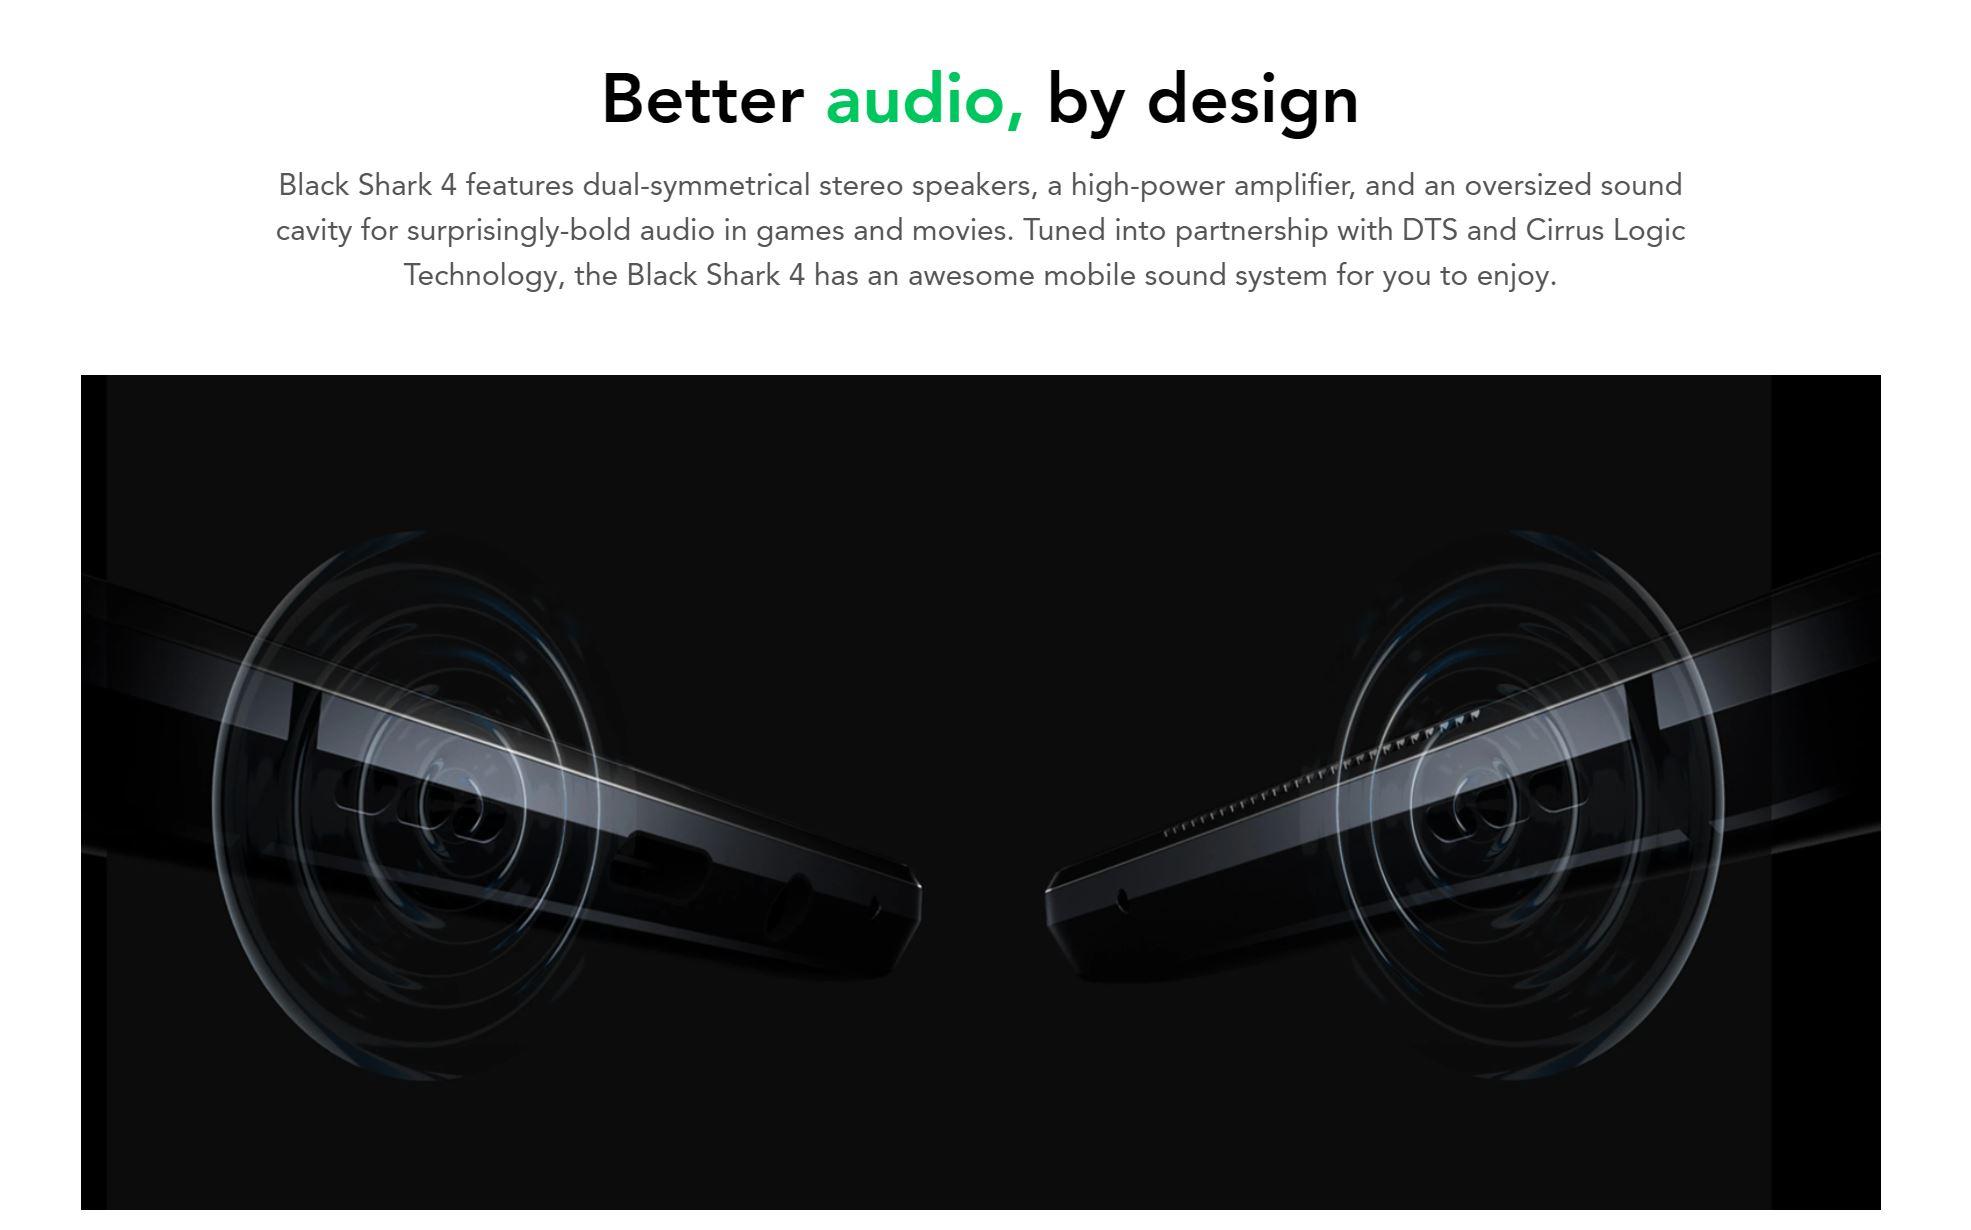 Premiera Black Shark 4 - audio DTS